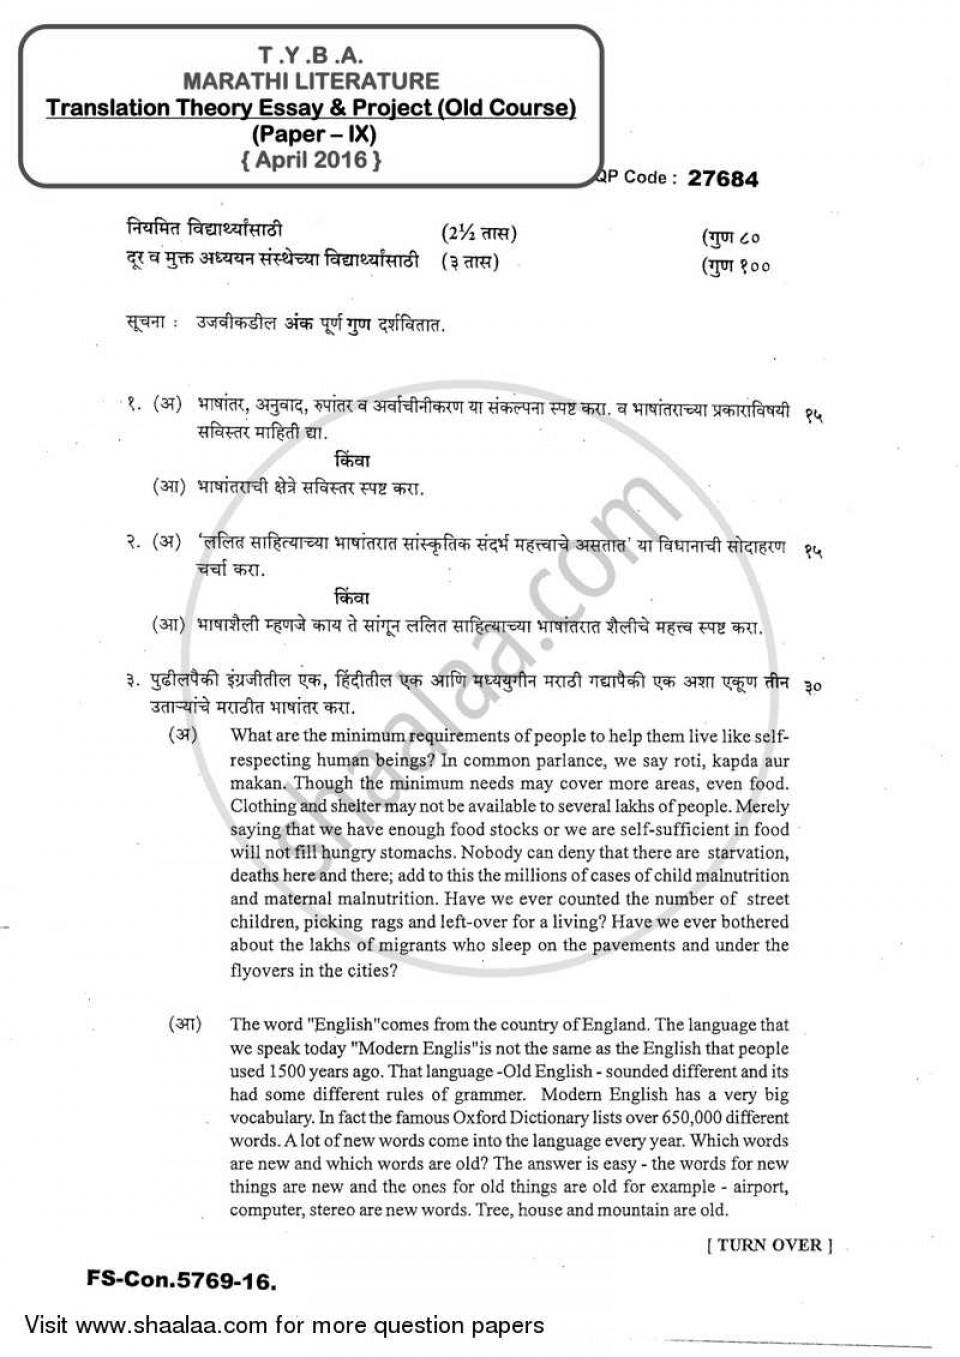 006 Essay Translation University Of Mumbai Bachelor Theory Project Bhashantar Rupantar Anuwad Ani Nibhanda Lekhan Tyba Marathi Yearly Pattern 3rd Year 2015 2f5542c8beffe4995a209 Stupendous Transitions In Spanish Transition Between Paragraphs 960